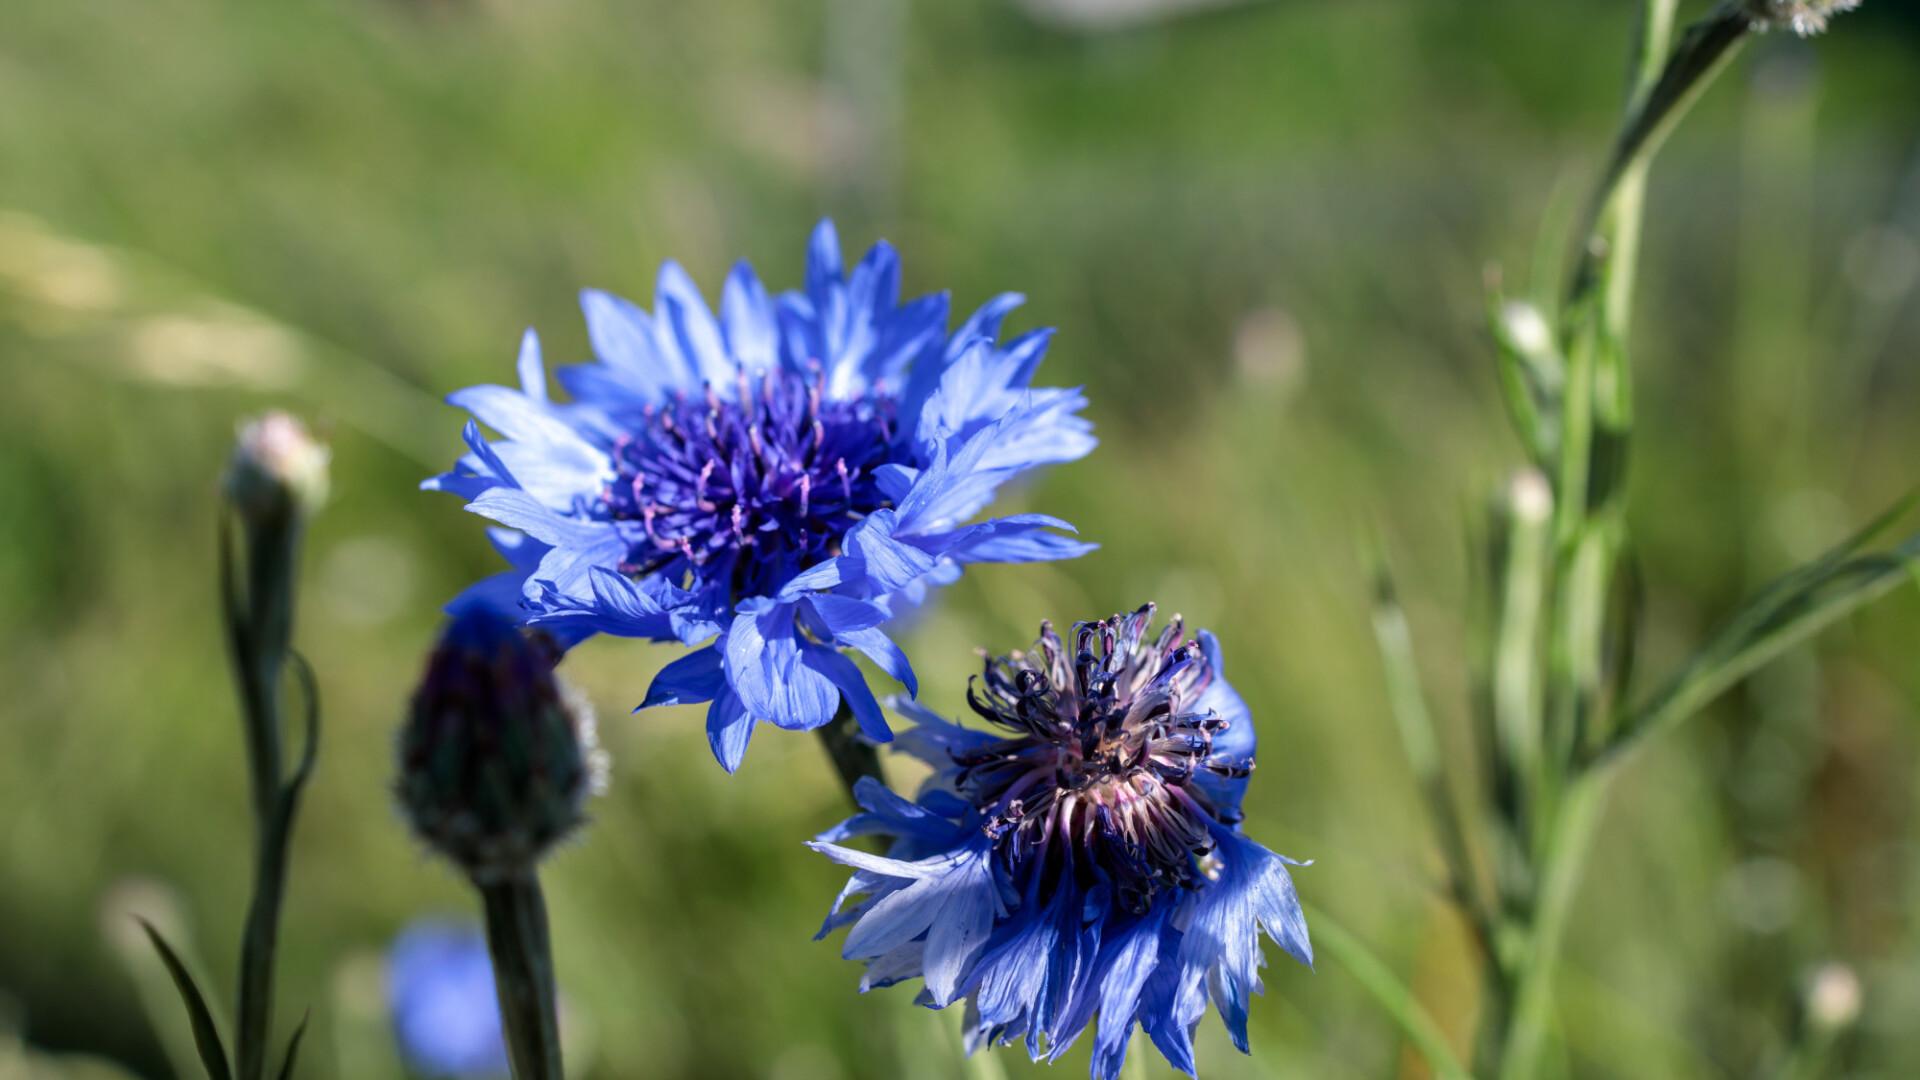 mountain cornflower, bachelor's button, montane knapweed or mountain bluet